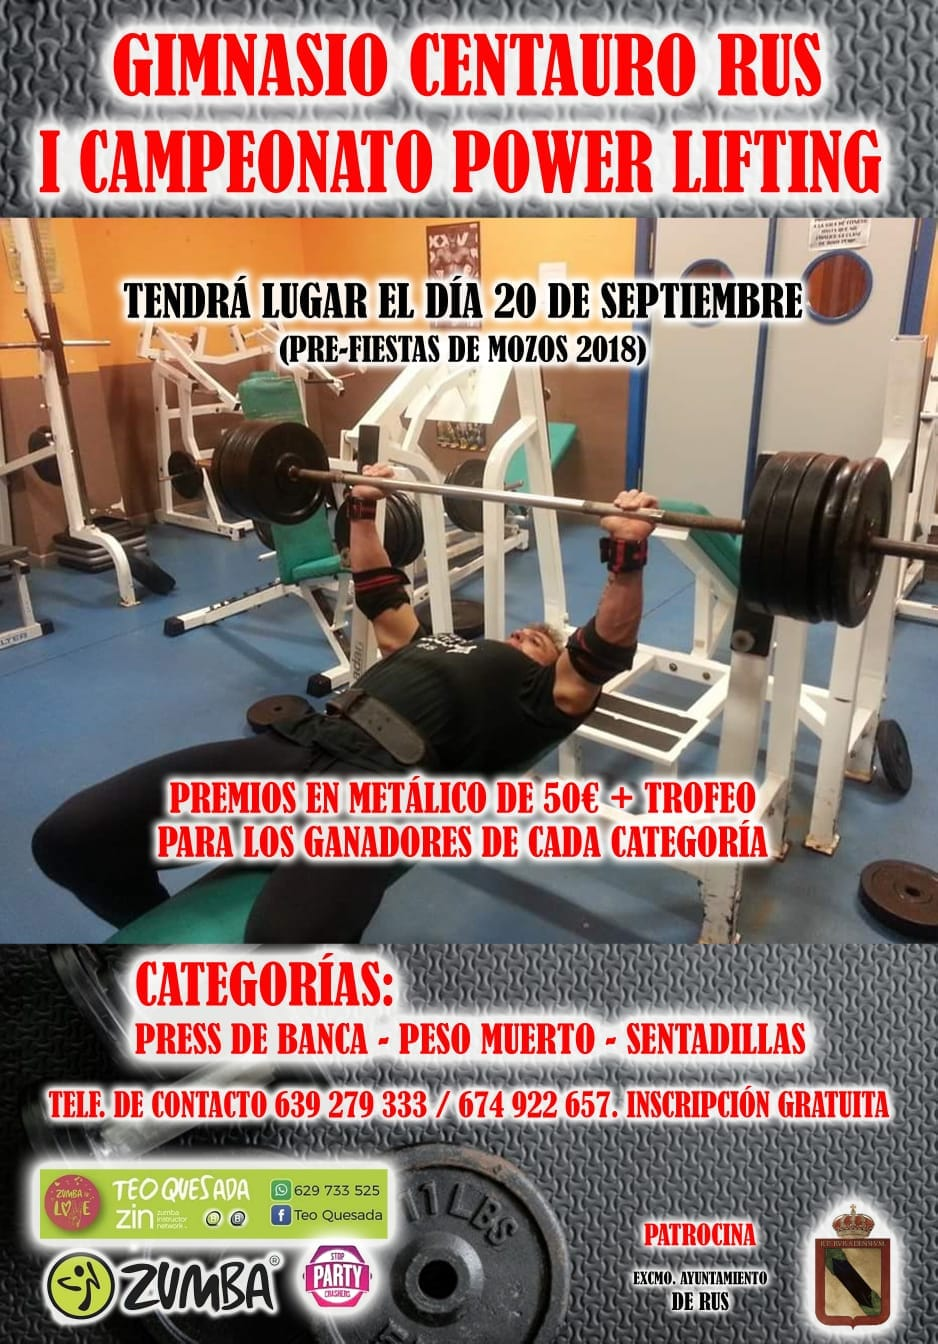 I Campeonato Power Lifting – Gimnasio Centauro